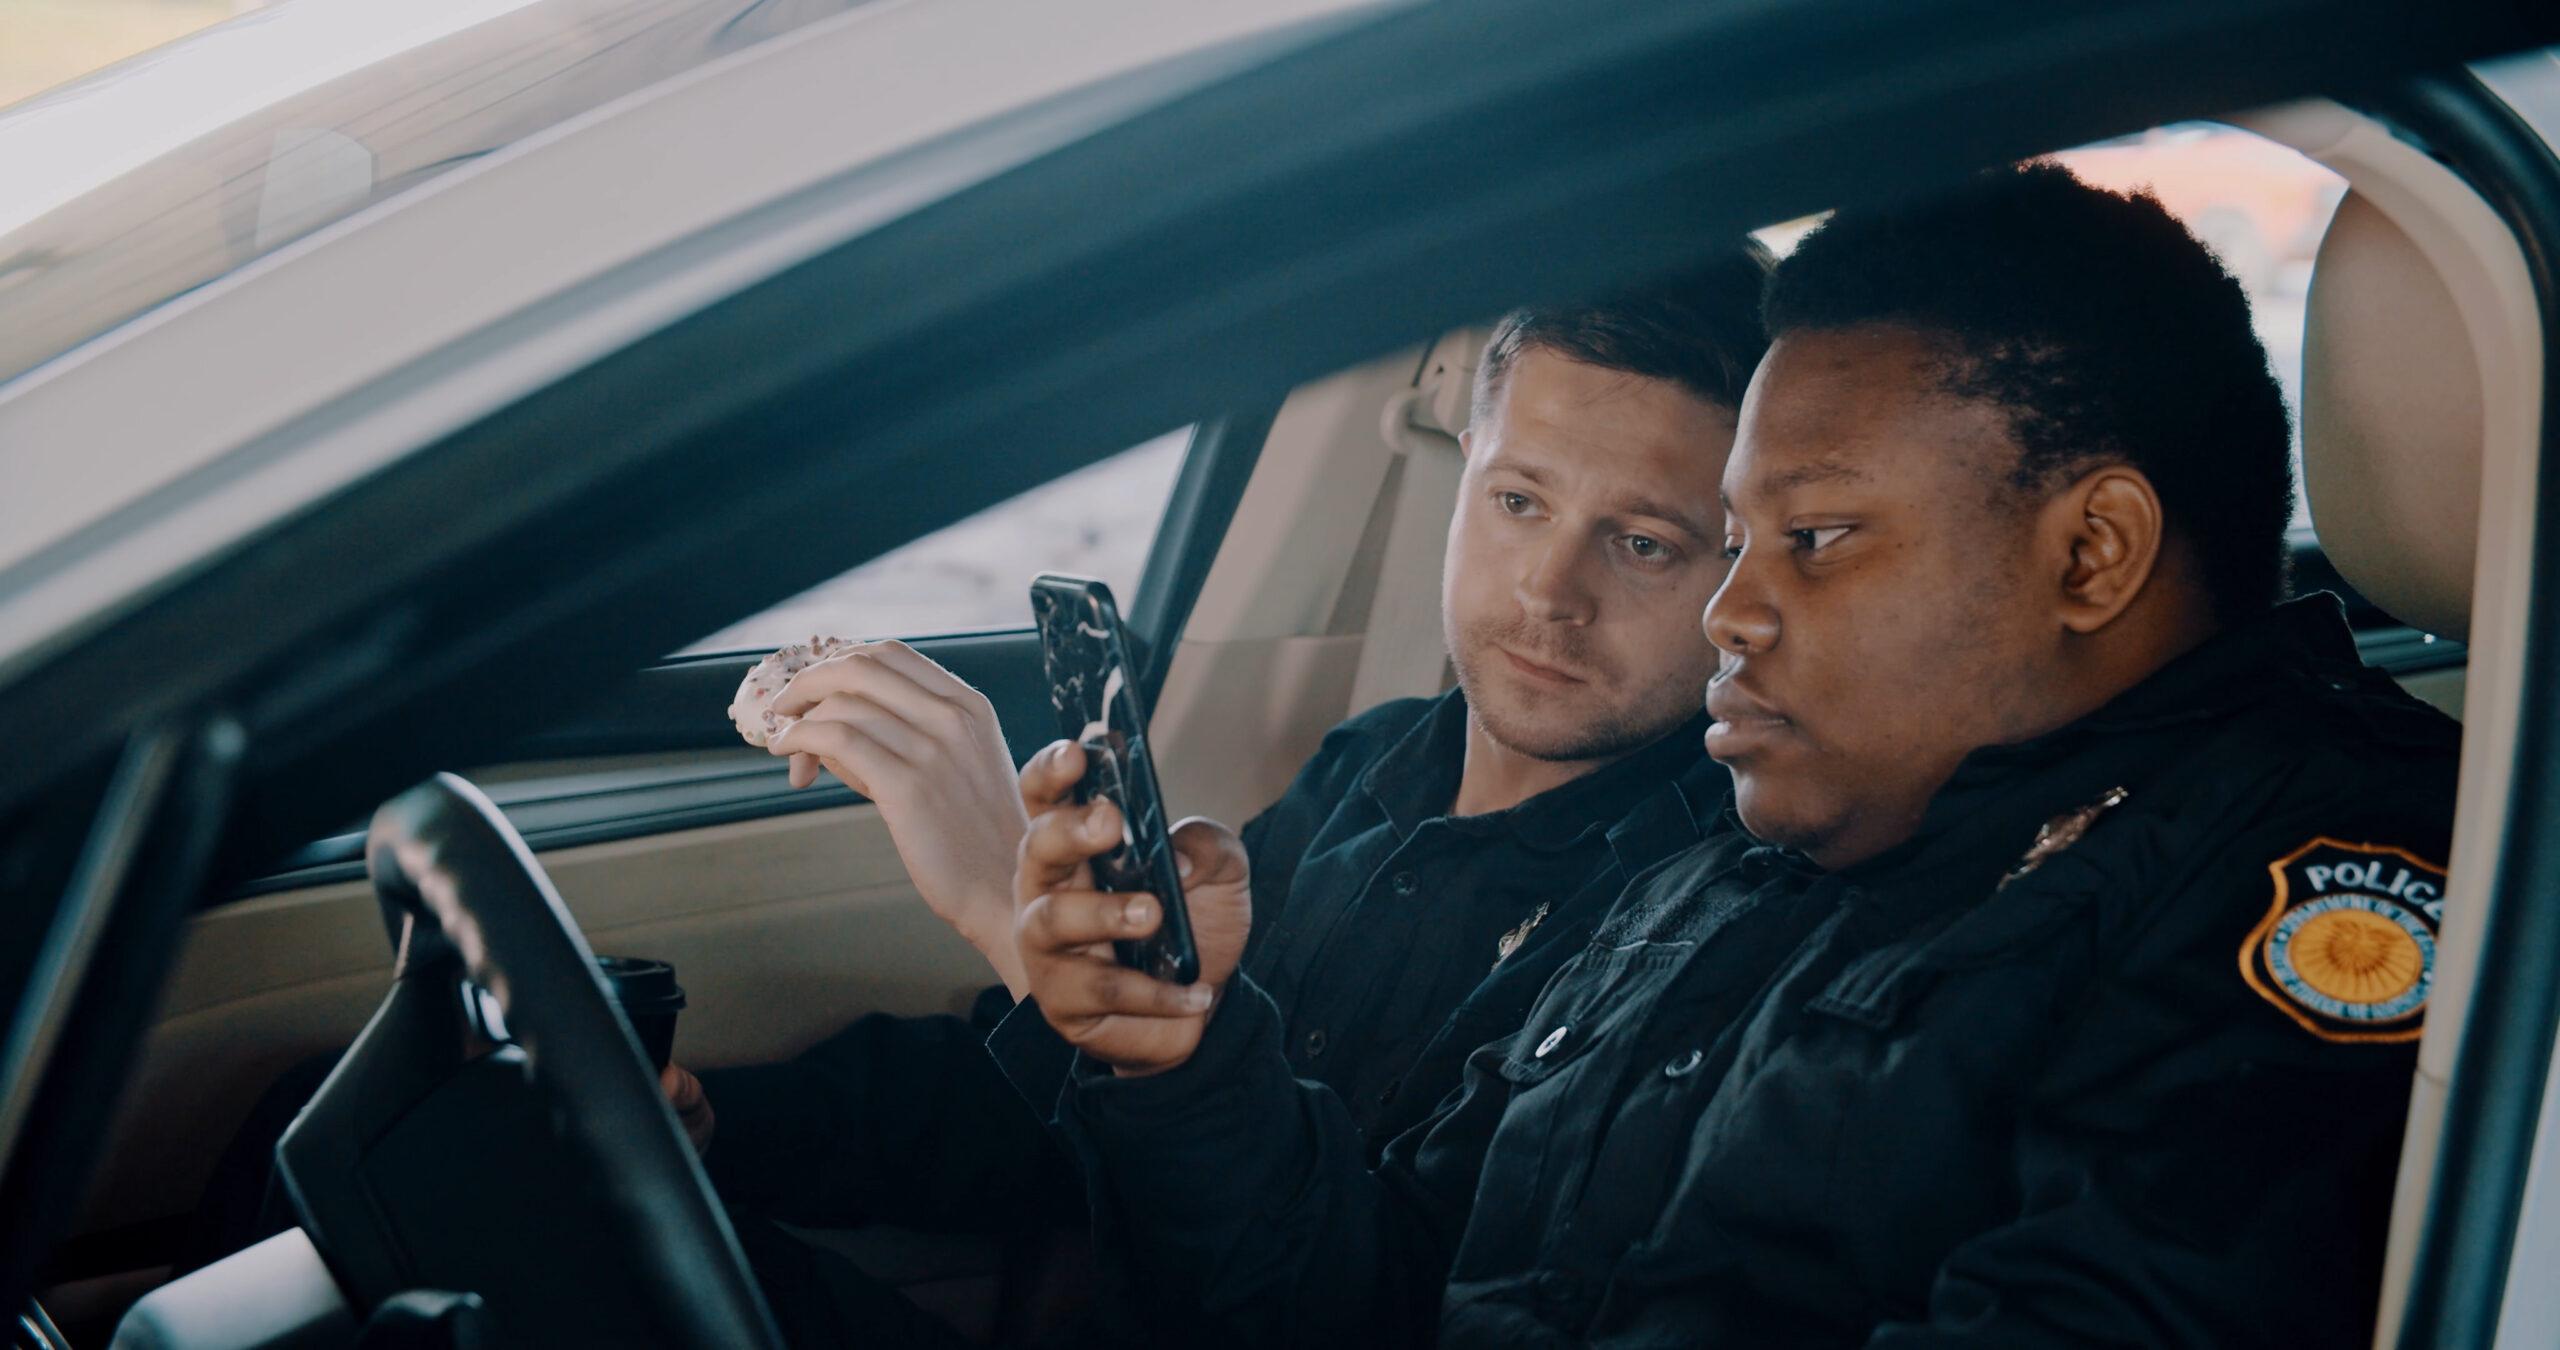 two policemen looking